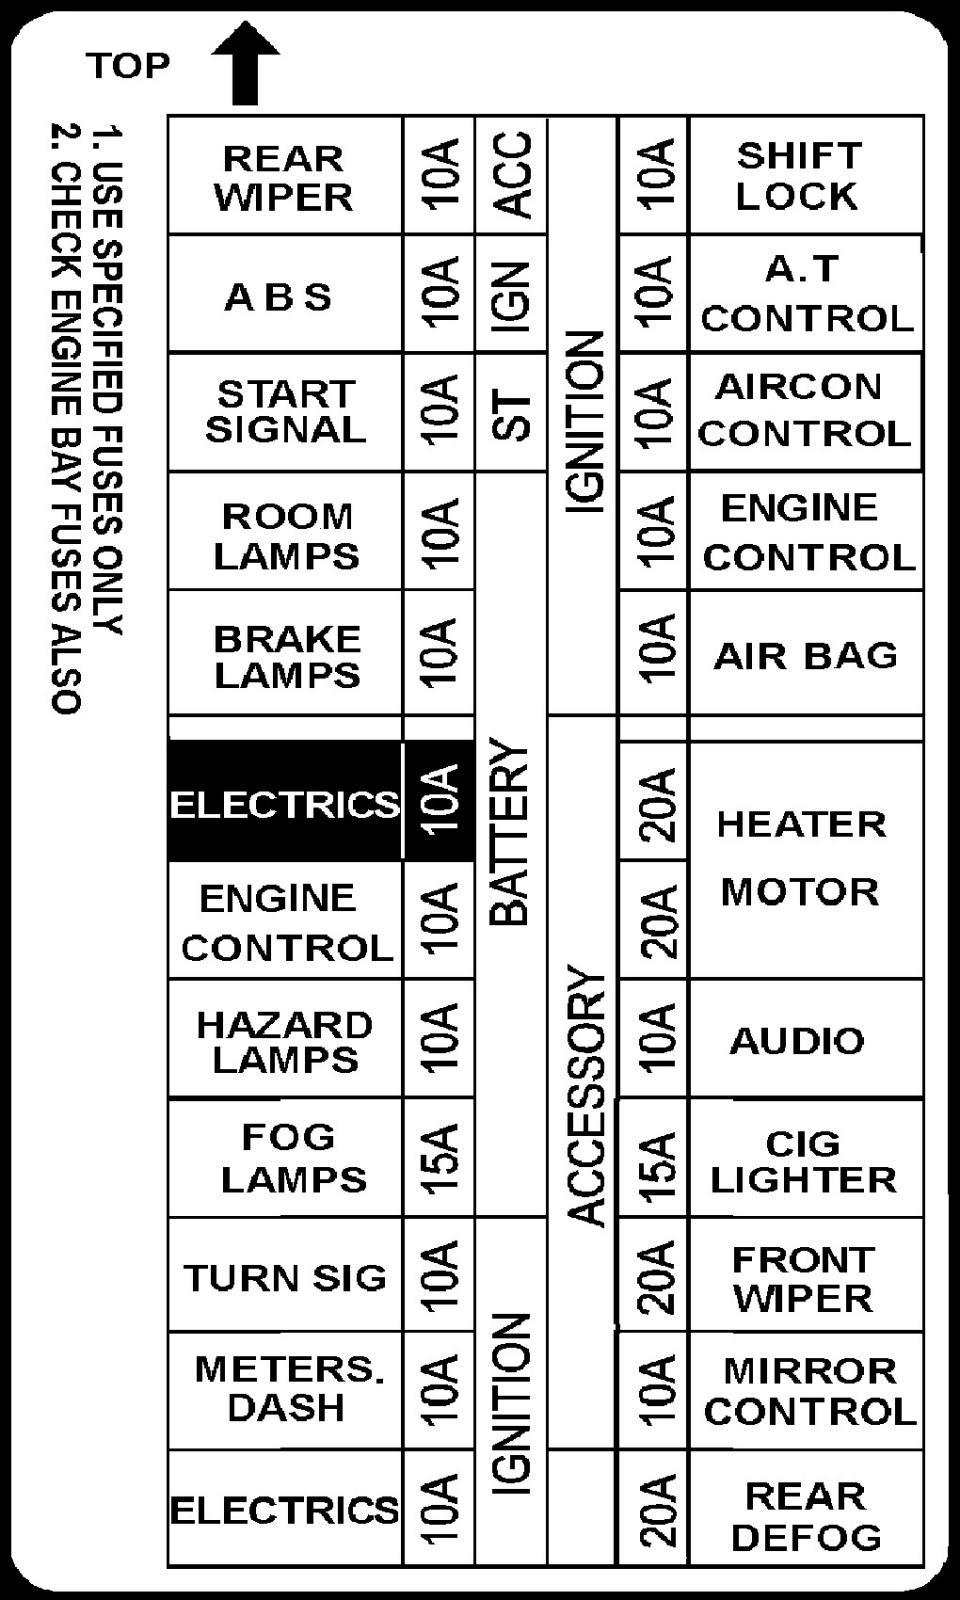 skyline r33 gtst wiring diagram volvo penta alternator fh schwabenschamanen de nissan gtr fuse box hub rh 19 6 dw germany